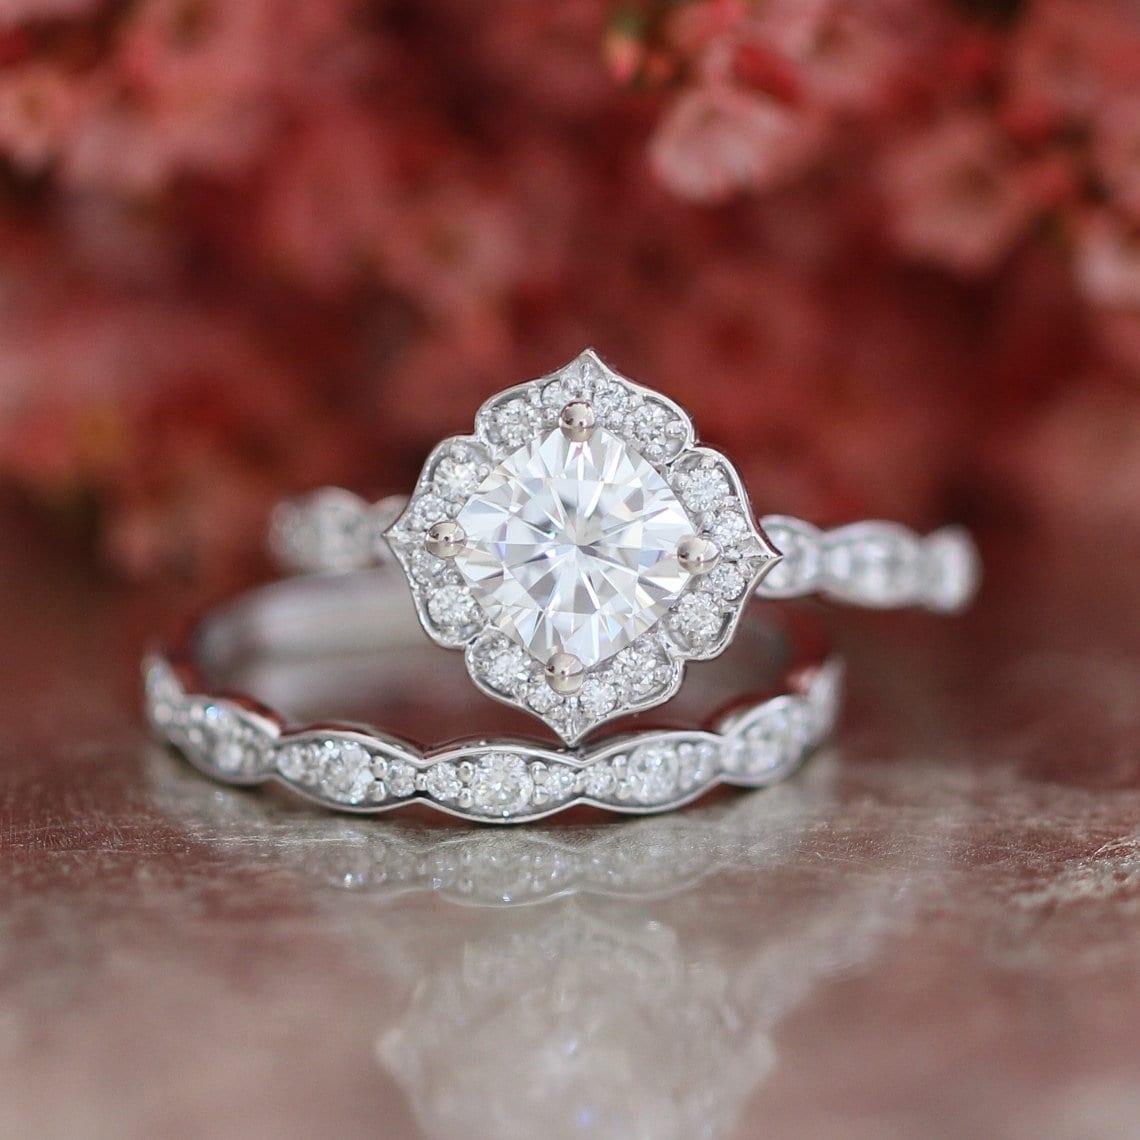 50: Cushion Cut Moissanite Wedding Ring Sets At Reisefeber.org